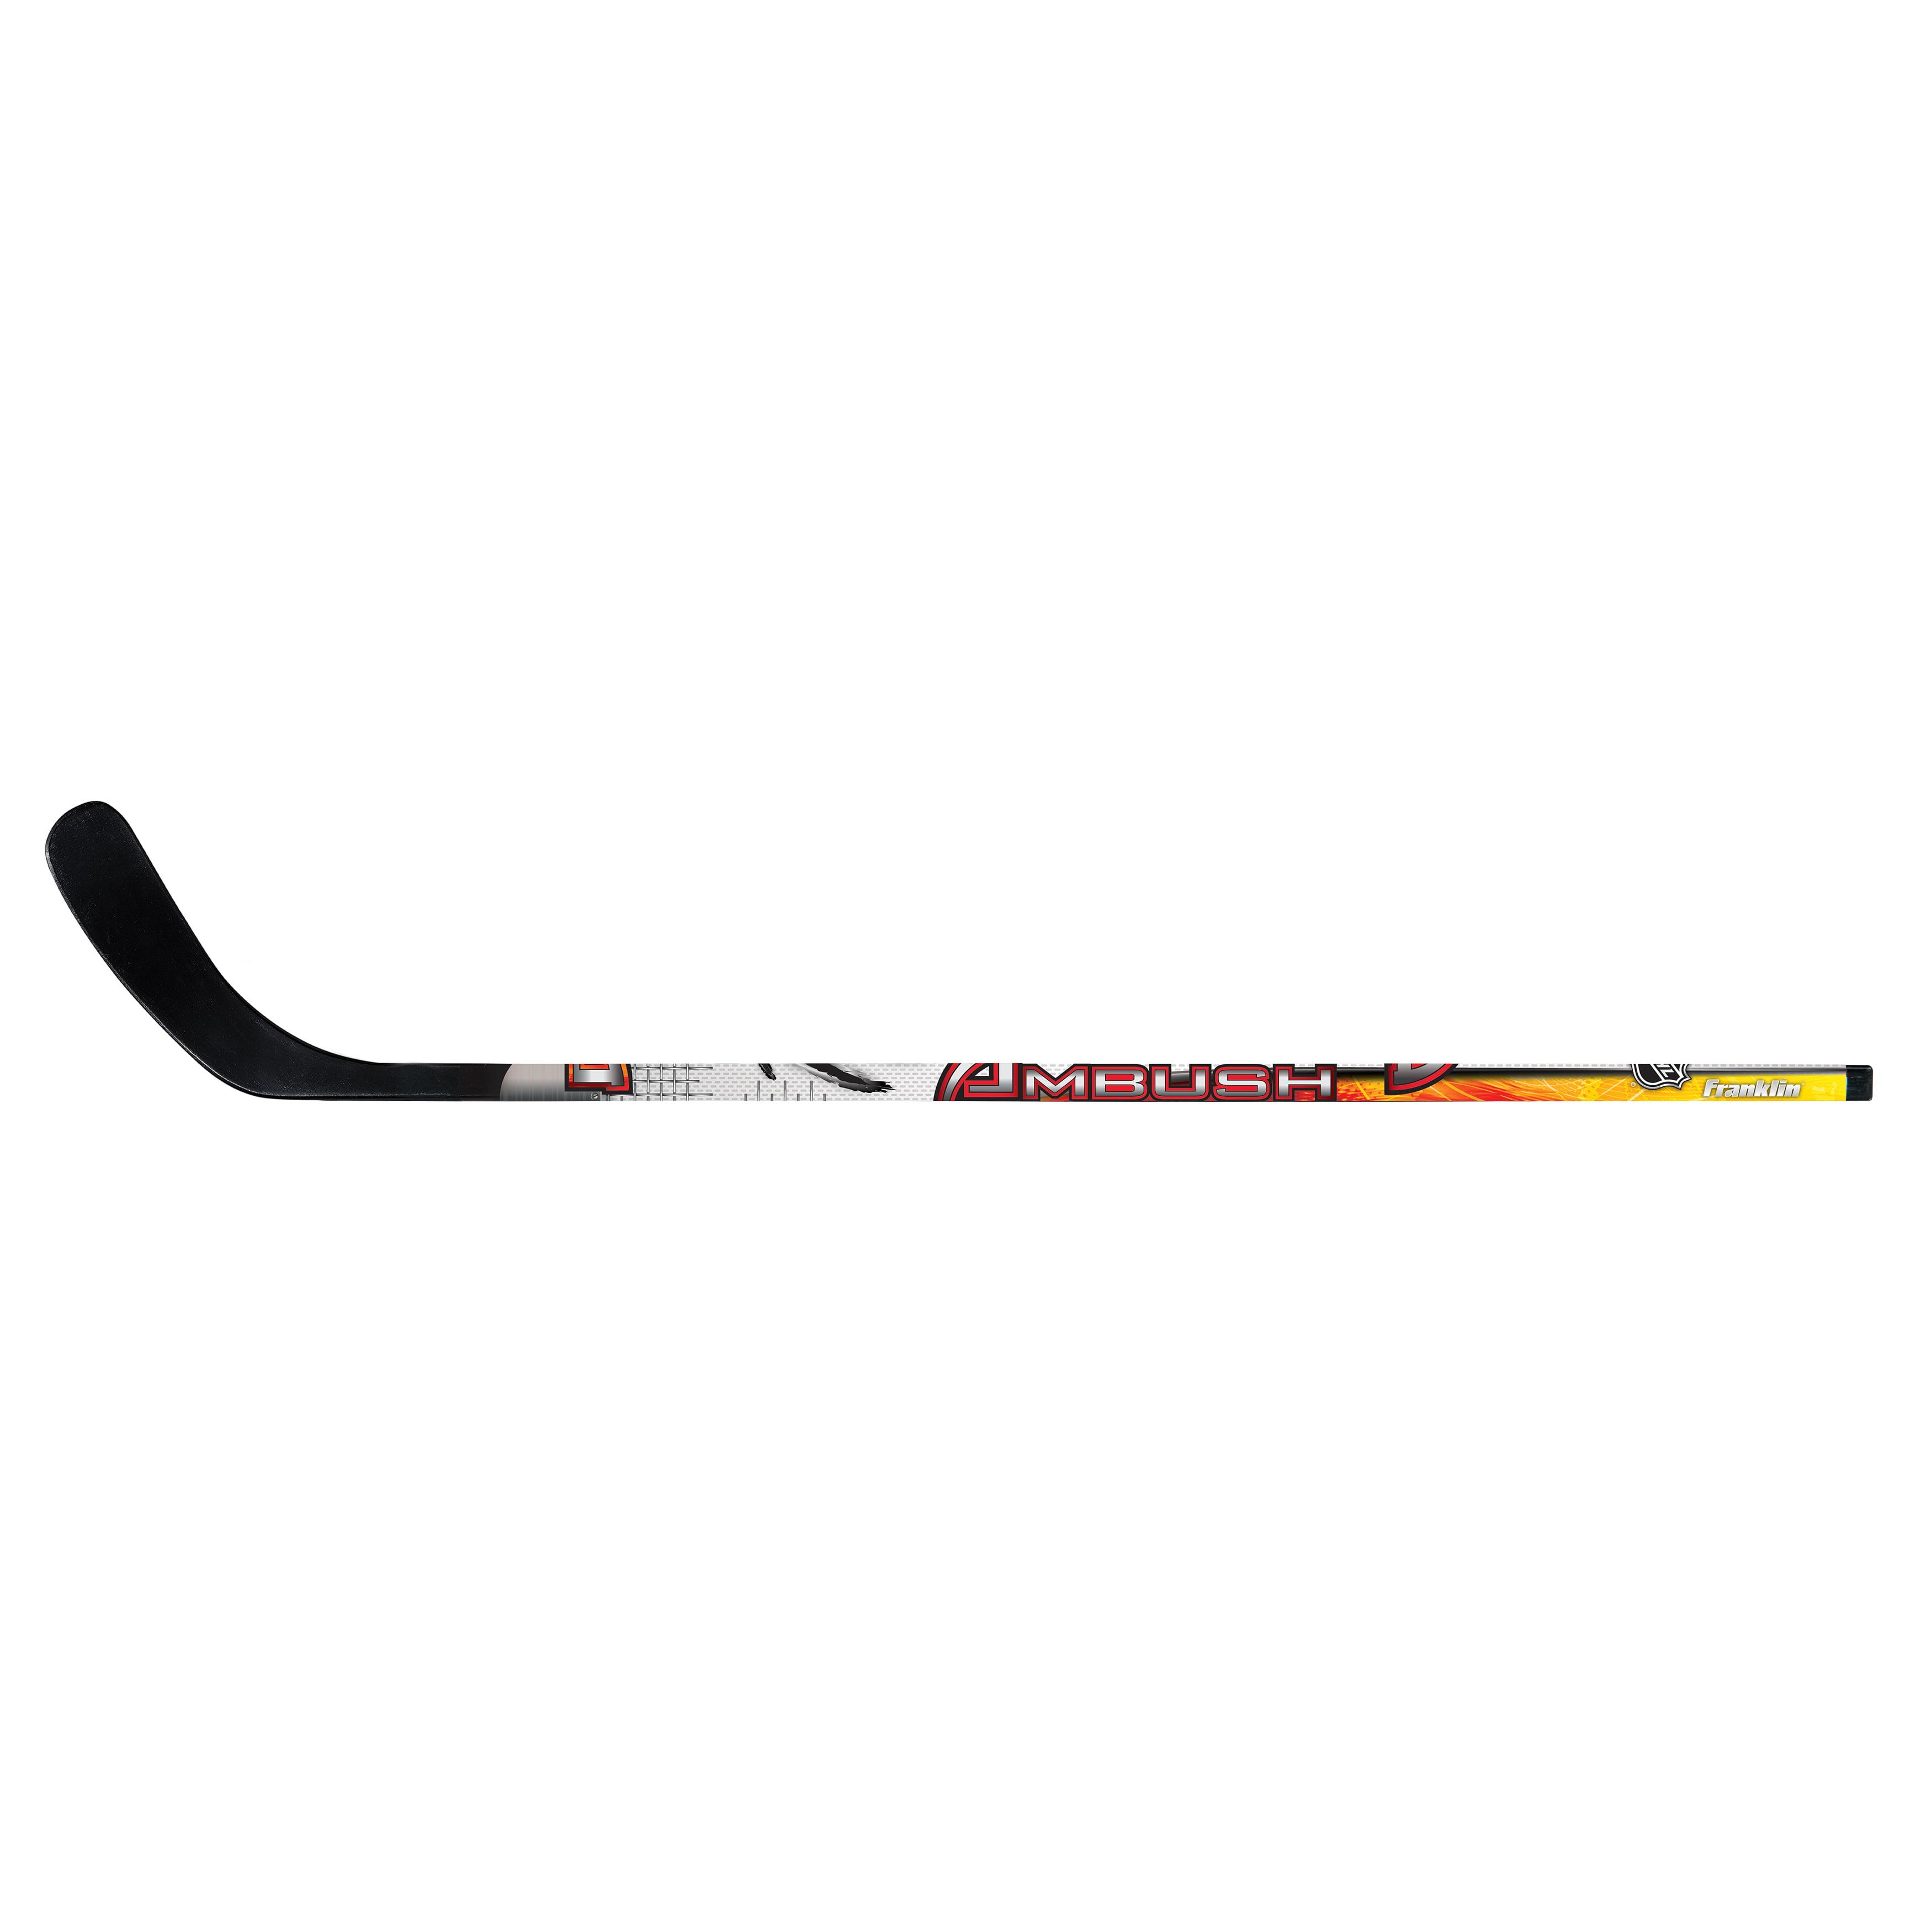 "Franklin Sports Sr. Right Shot Ambush Street Hockey Stick 58"" by Franklin Sports"